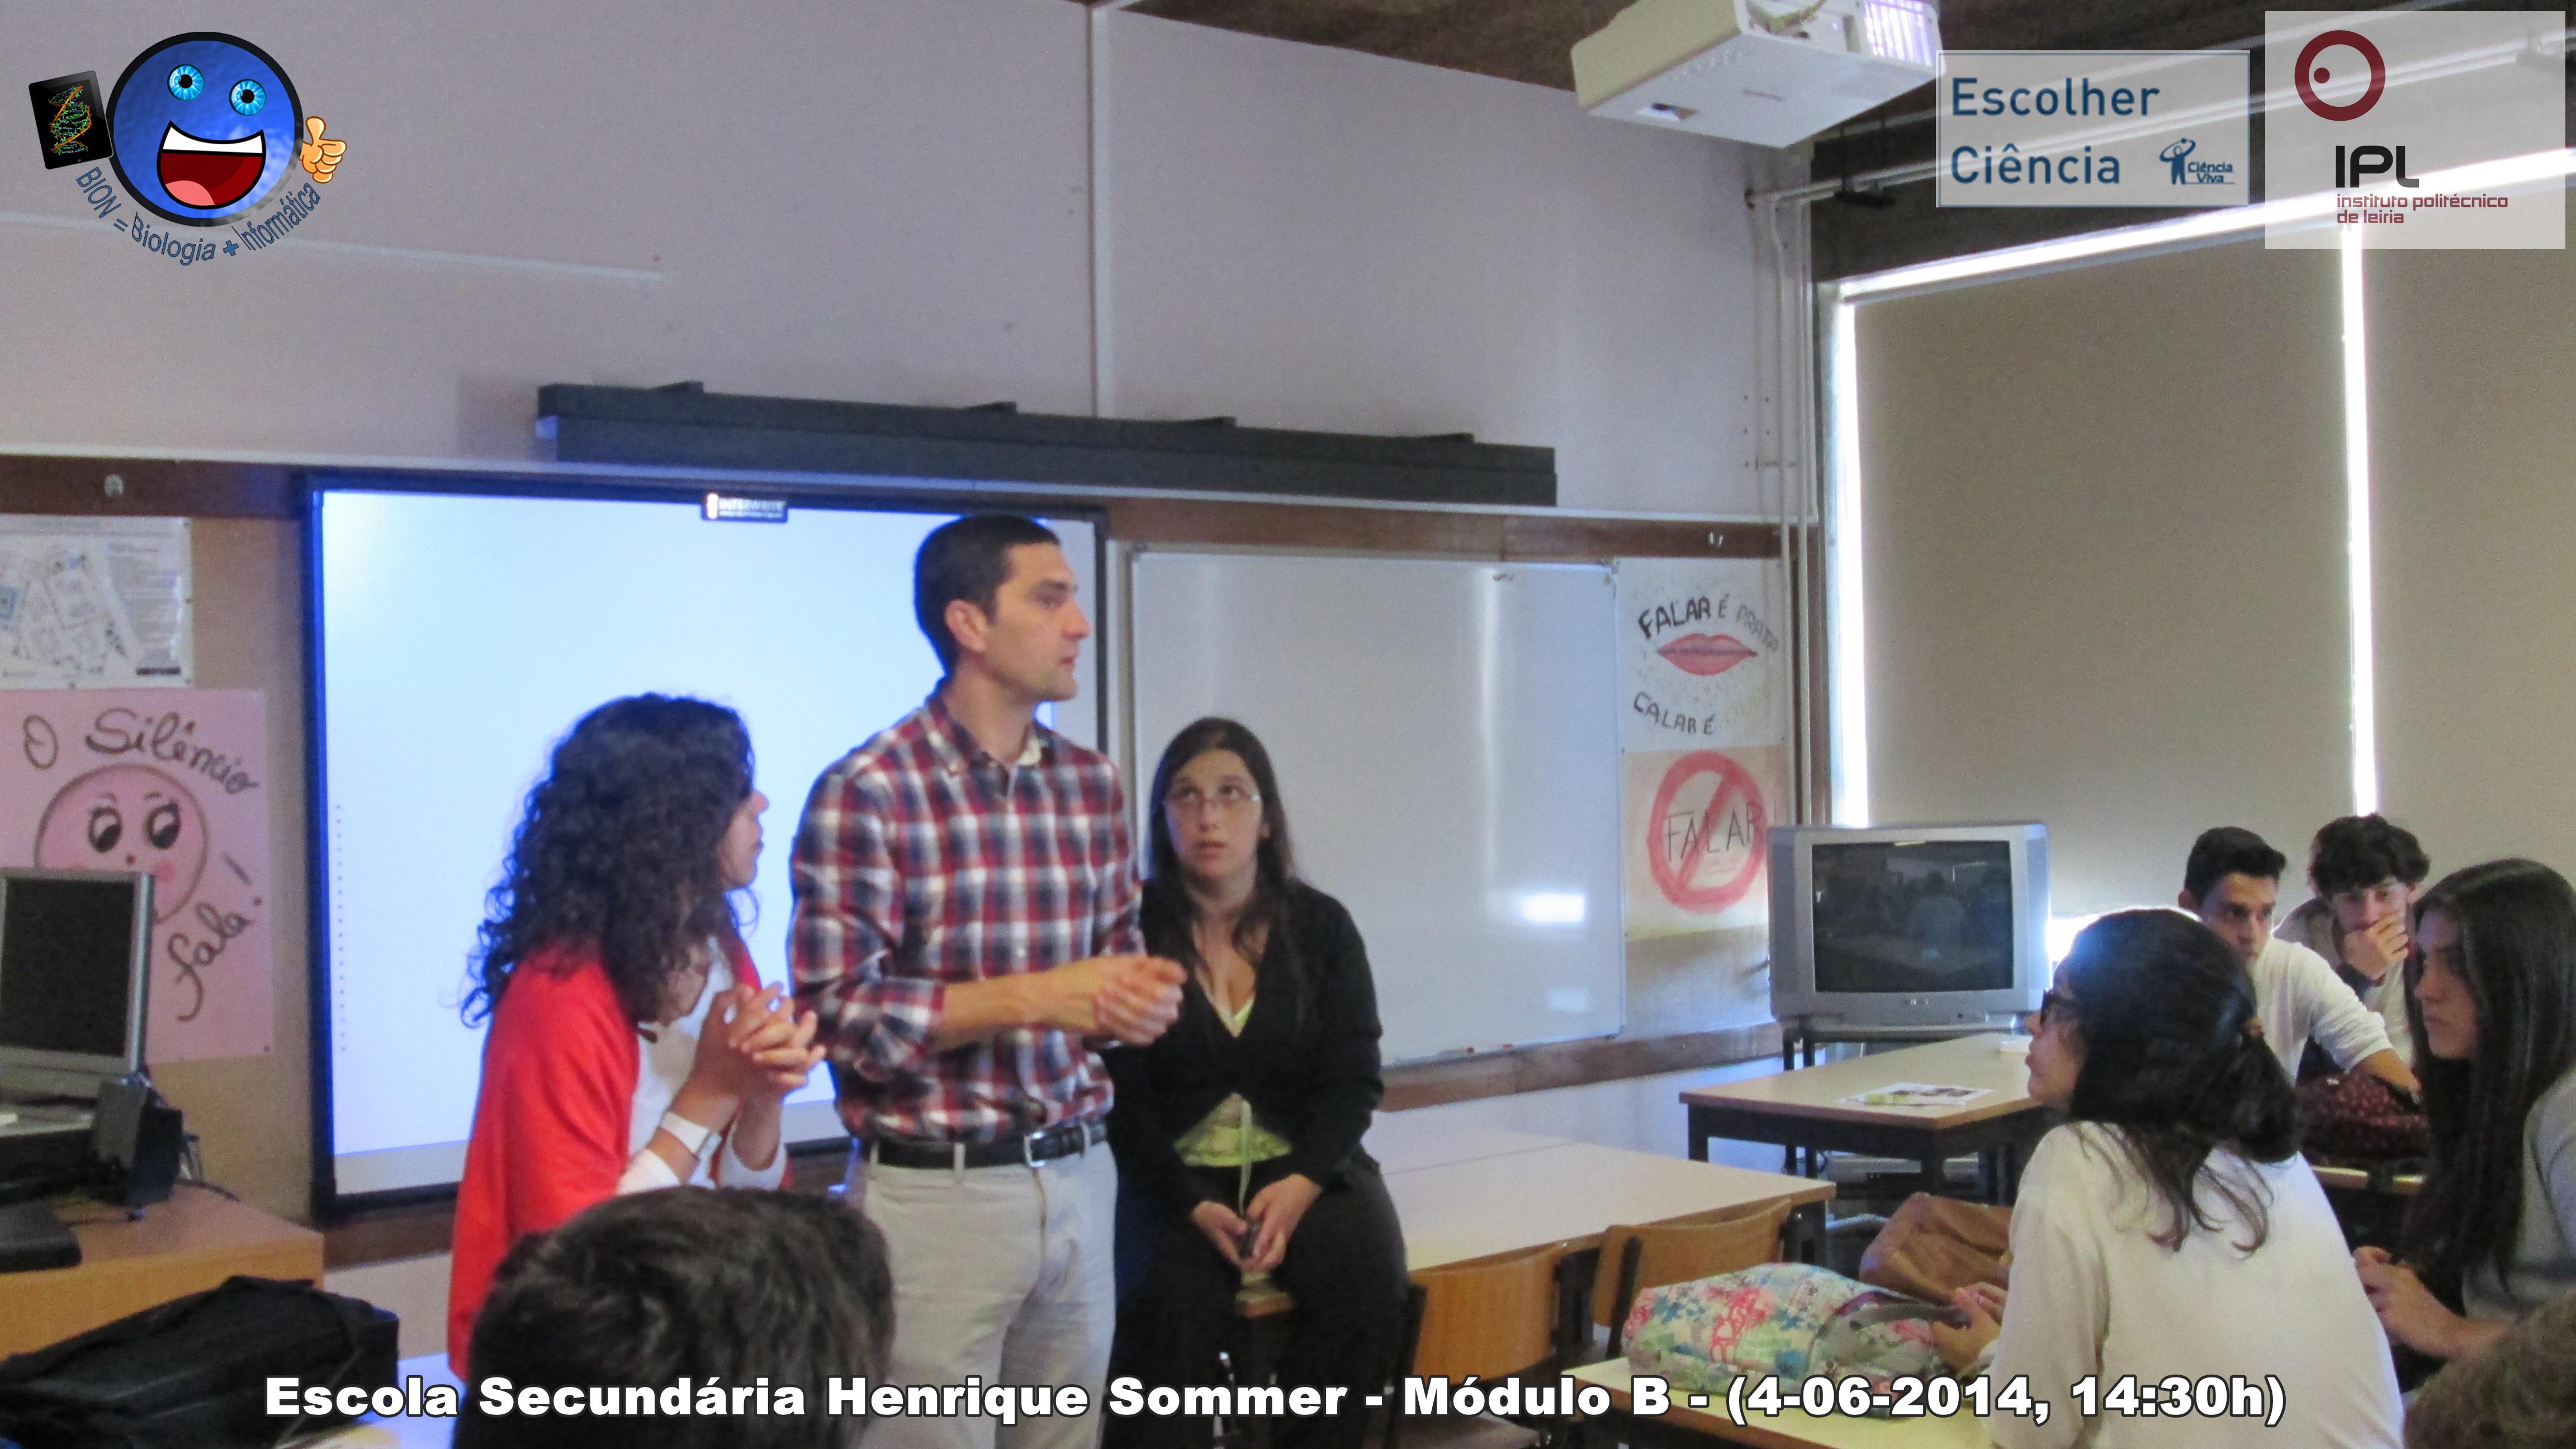 Modulo B - Escola Secundária Henrique Sommer